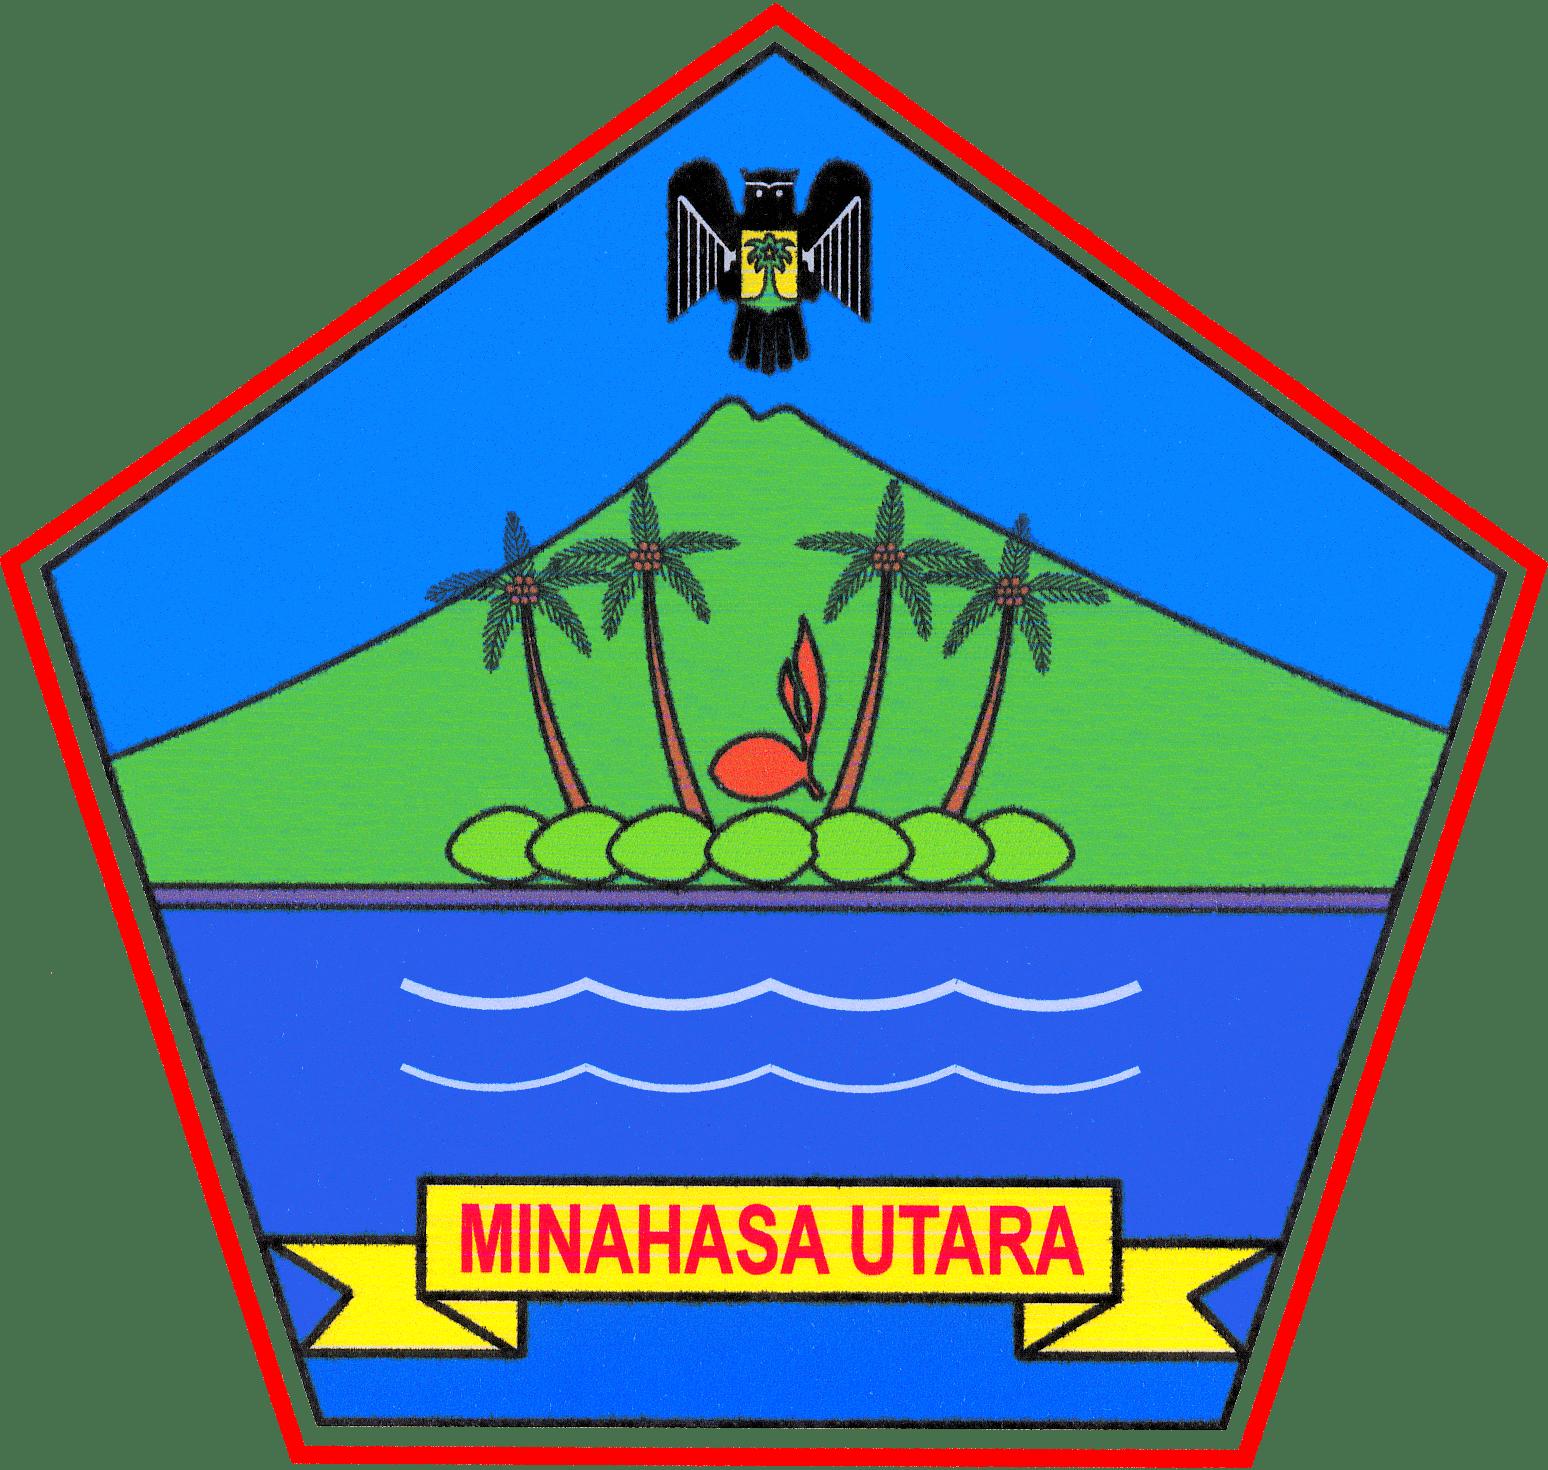 Bpk Ri Perwakilan Provinsi Sulawesi Utara Pemerintah Kabupaten Logo Minahasa